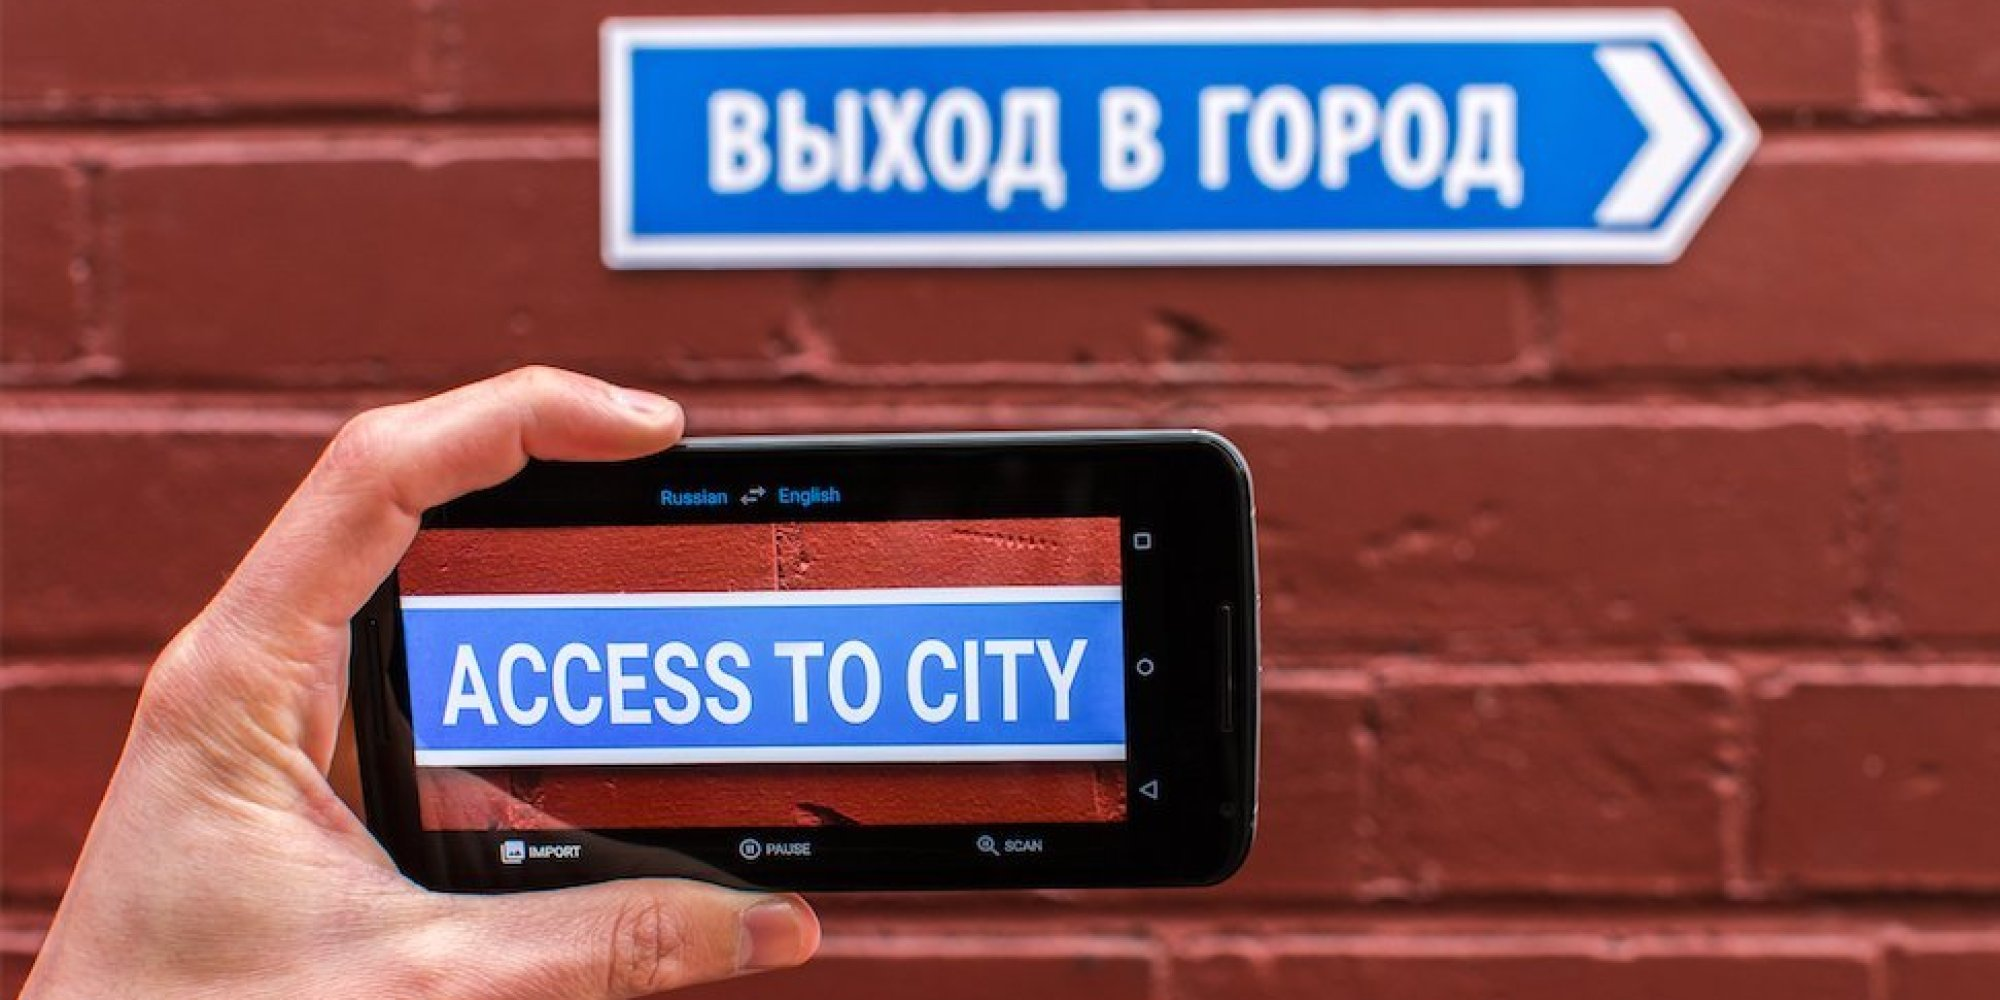 real time translate google traduction Google Traduction adopte le mode Split View sur liPad